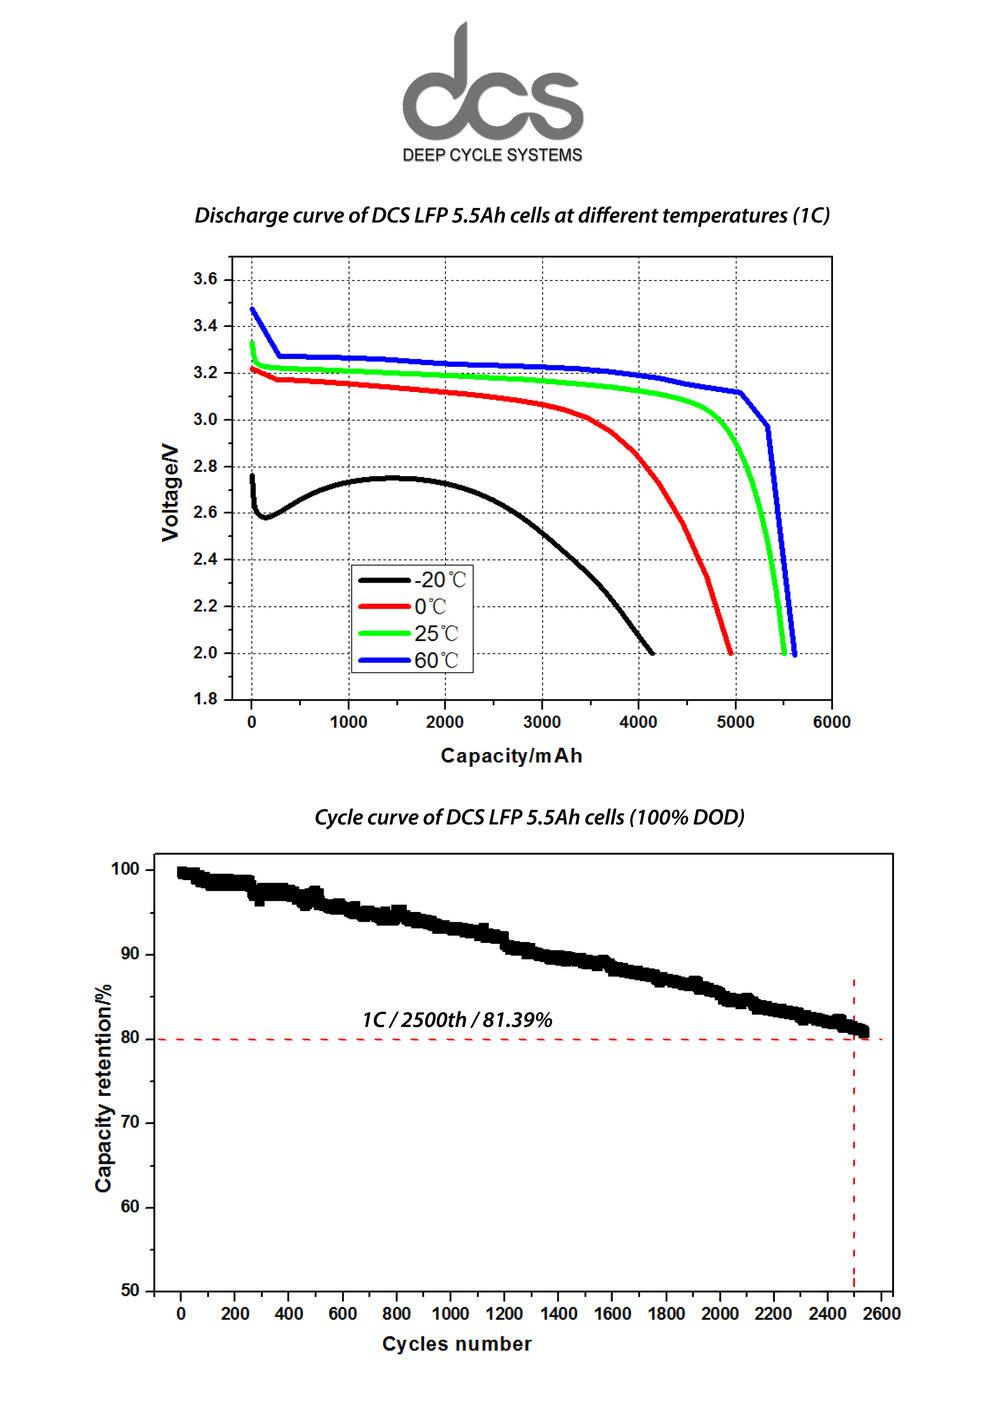 DCS LFP 5.5Ah cell technology cycle data